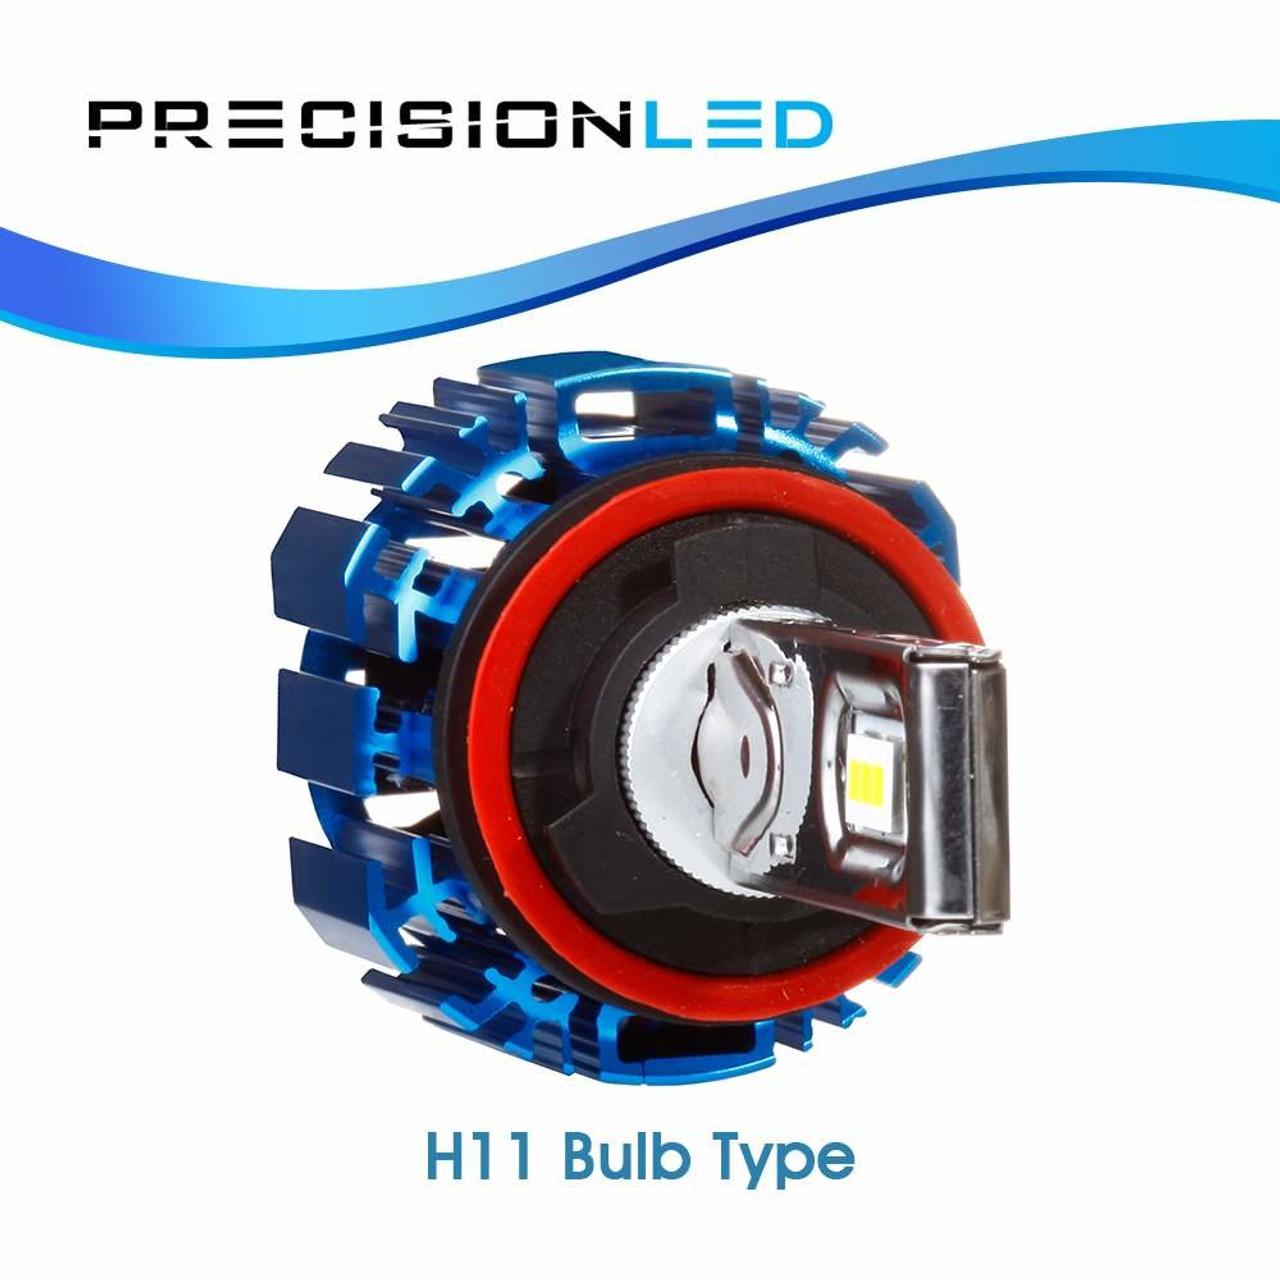 Scion xB Premium LED Headlight package (2008 - 2015)